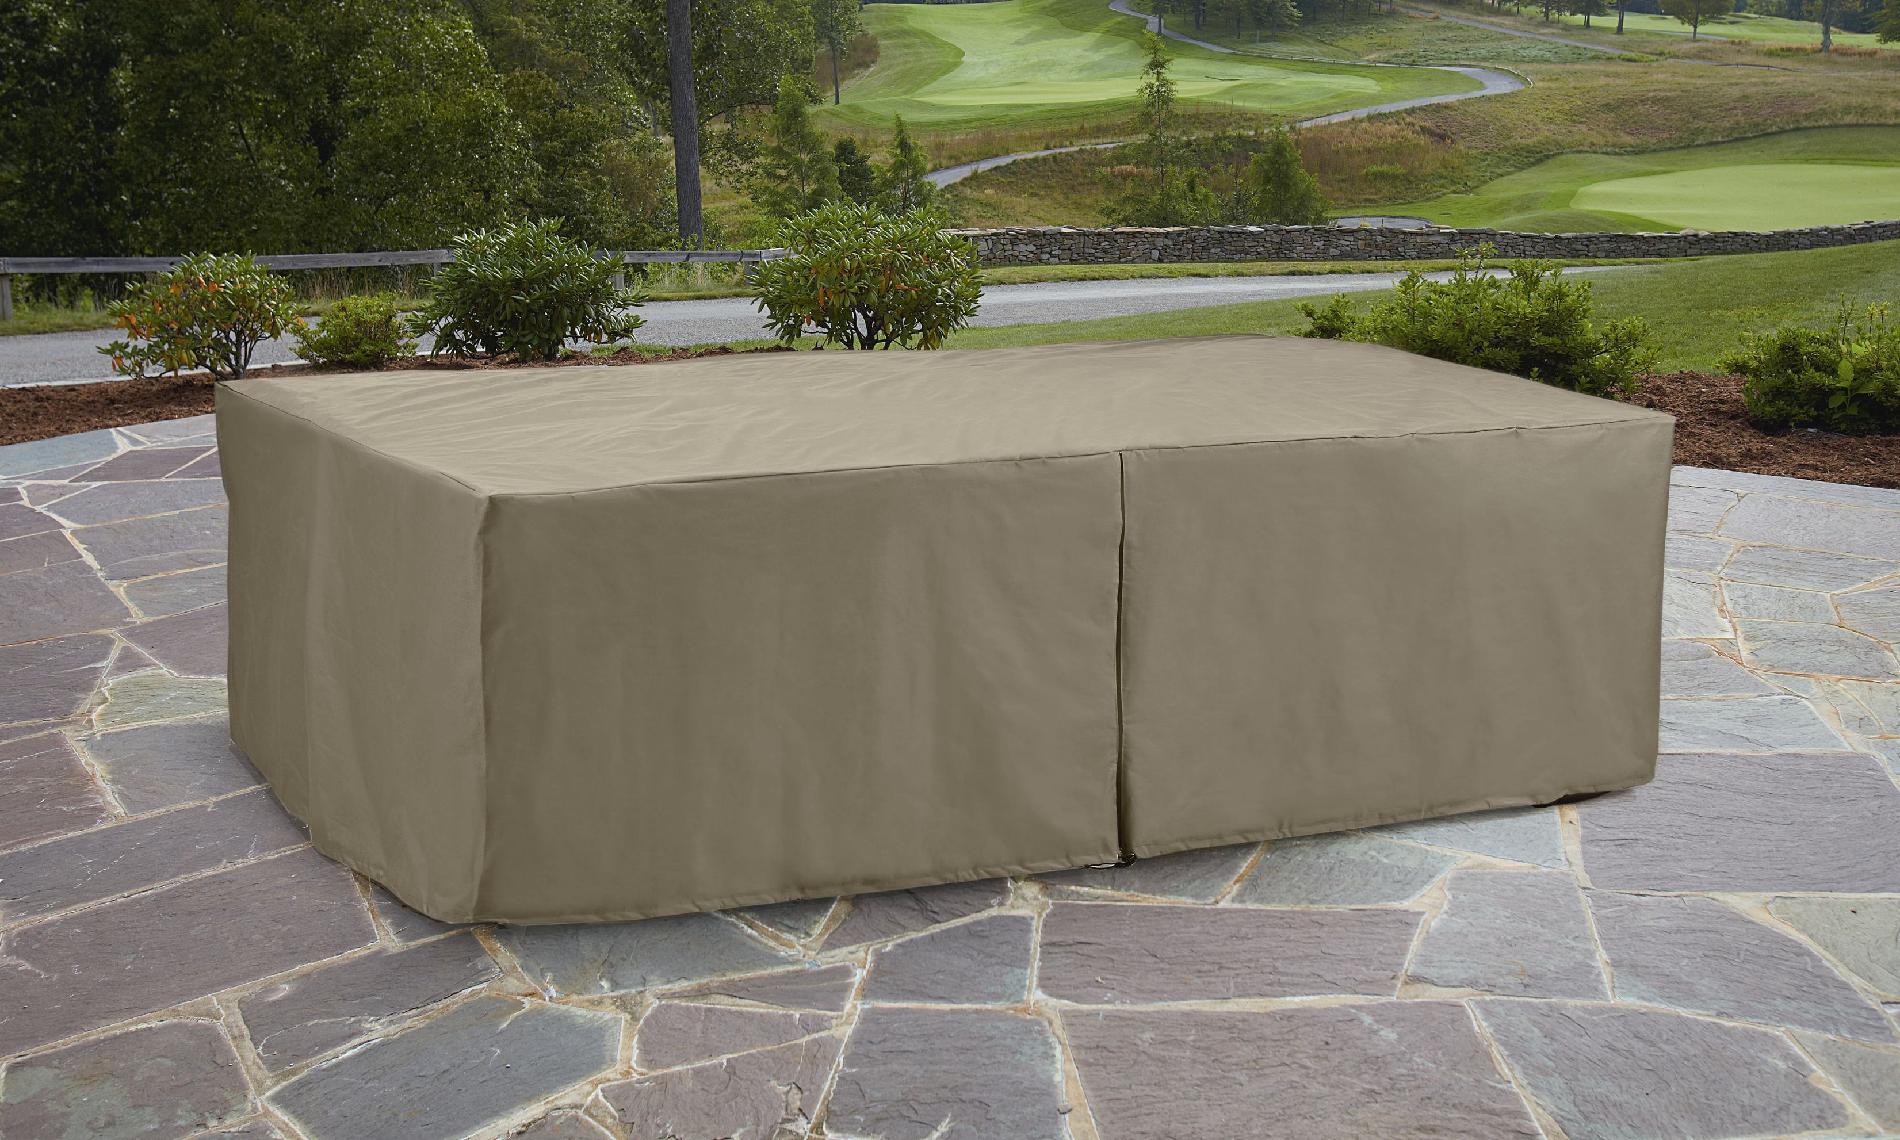 Garden Oasis Oversized Rectangle Patio Furniture Set Cover